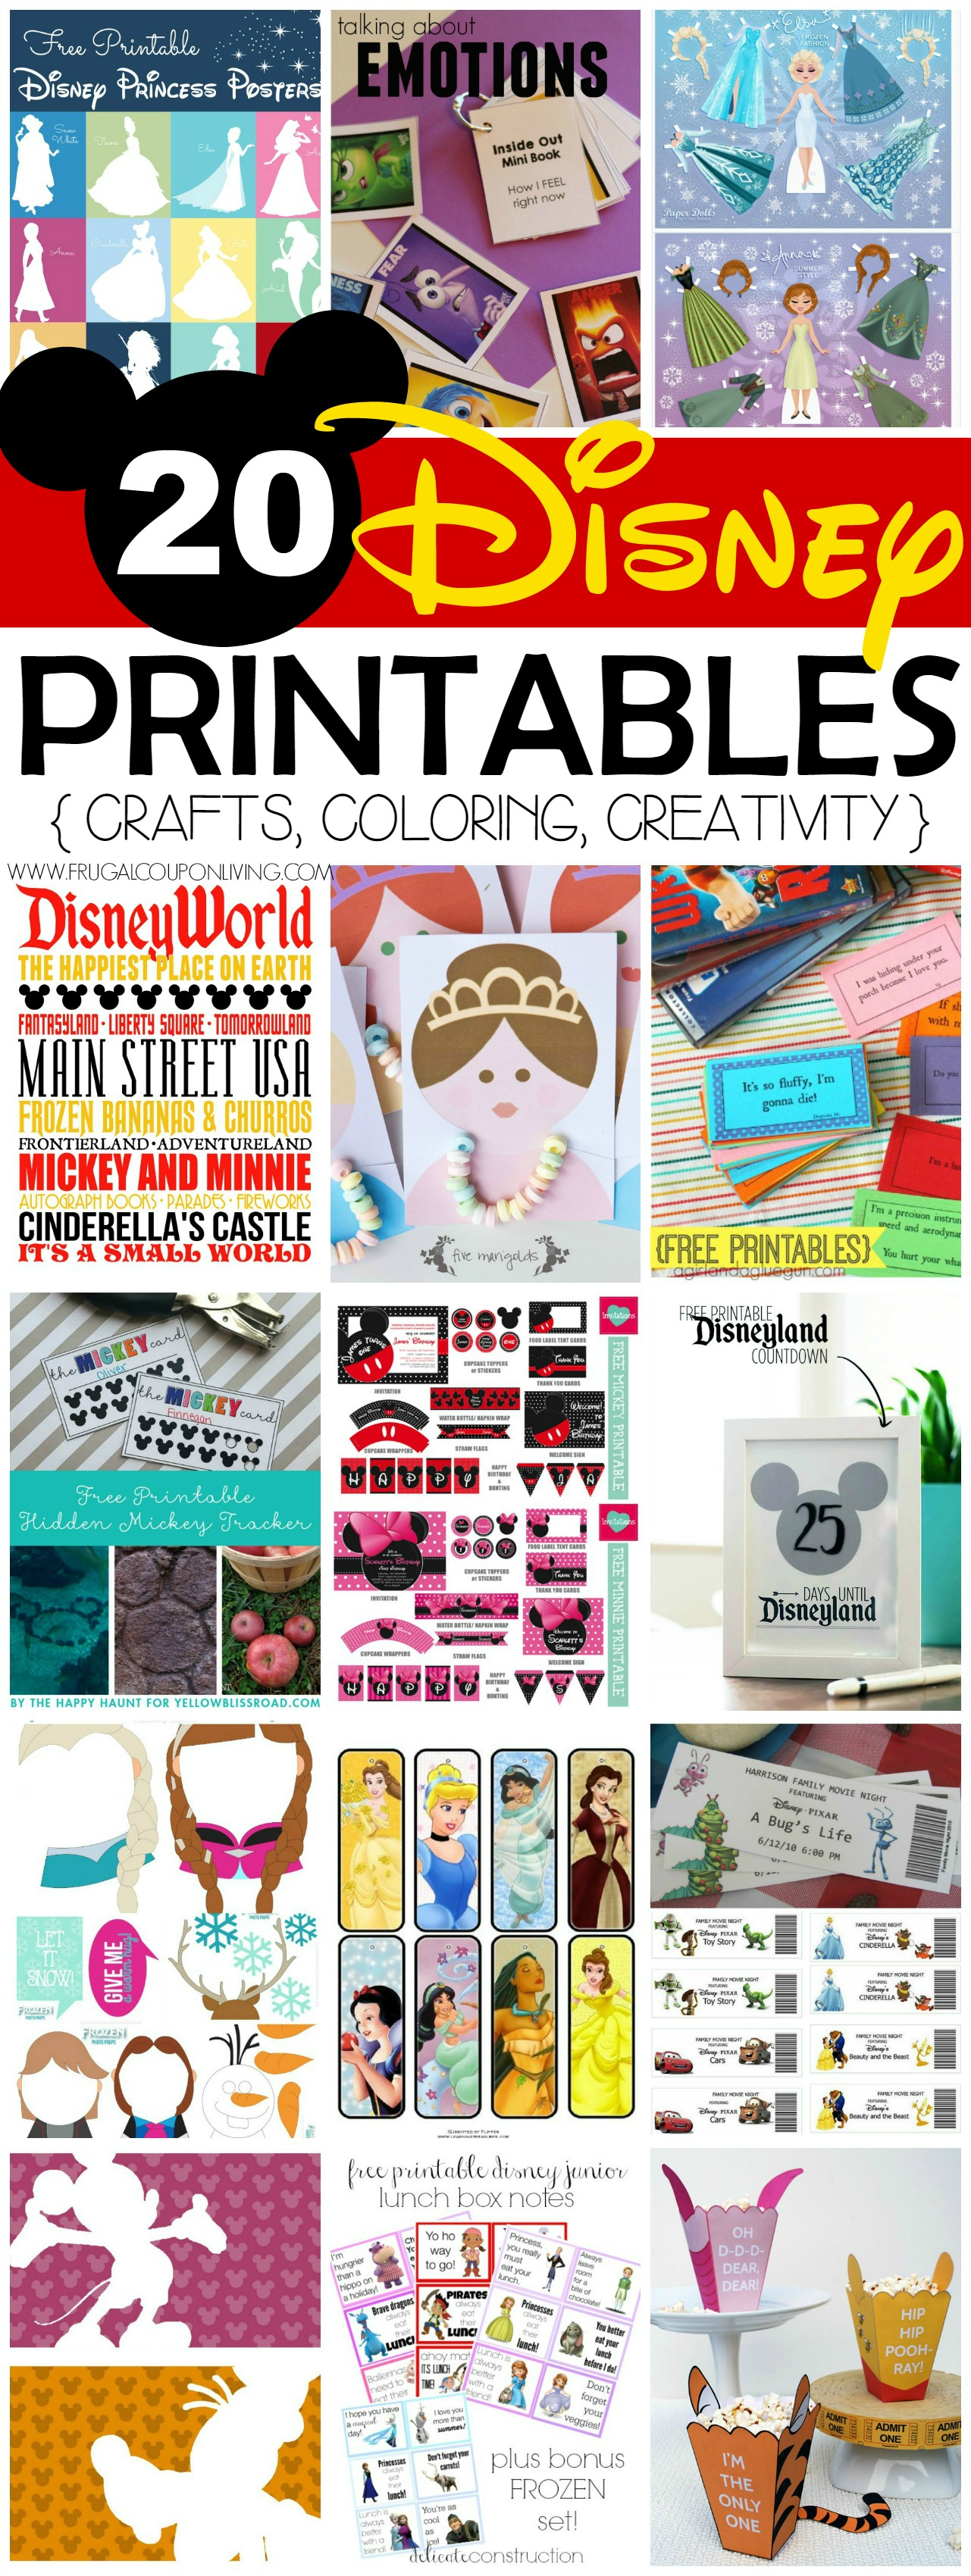 20 Free Disney Printables